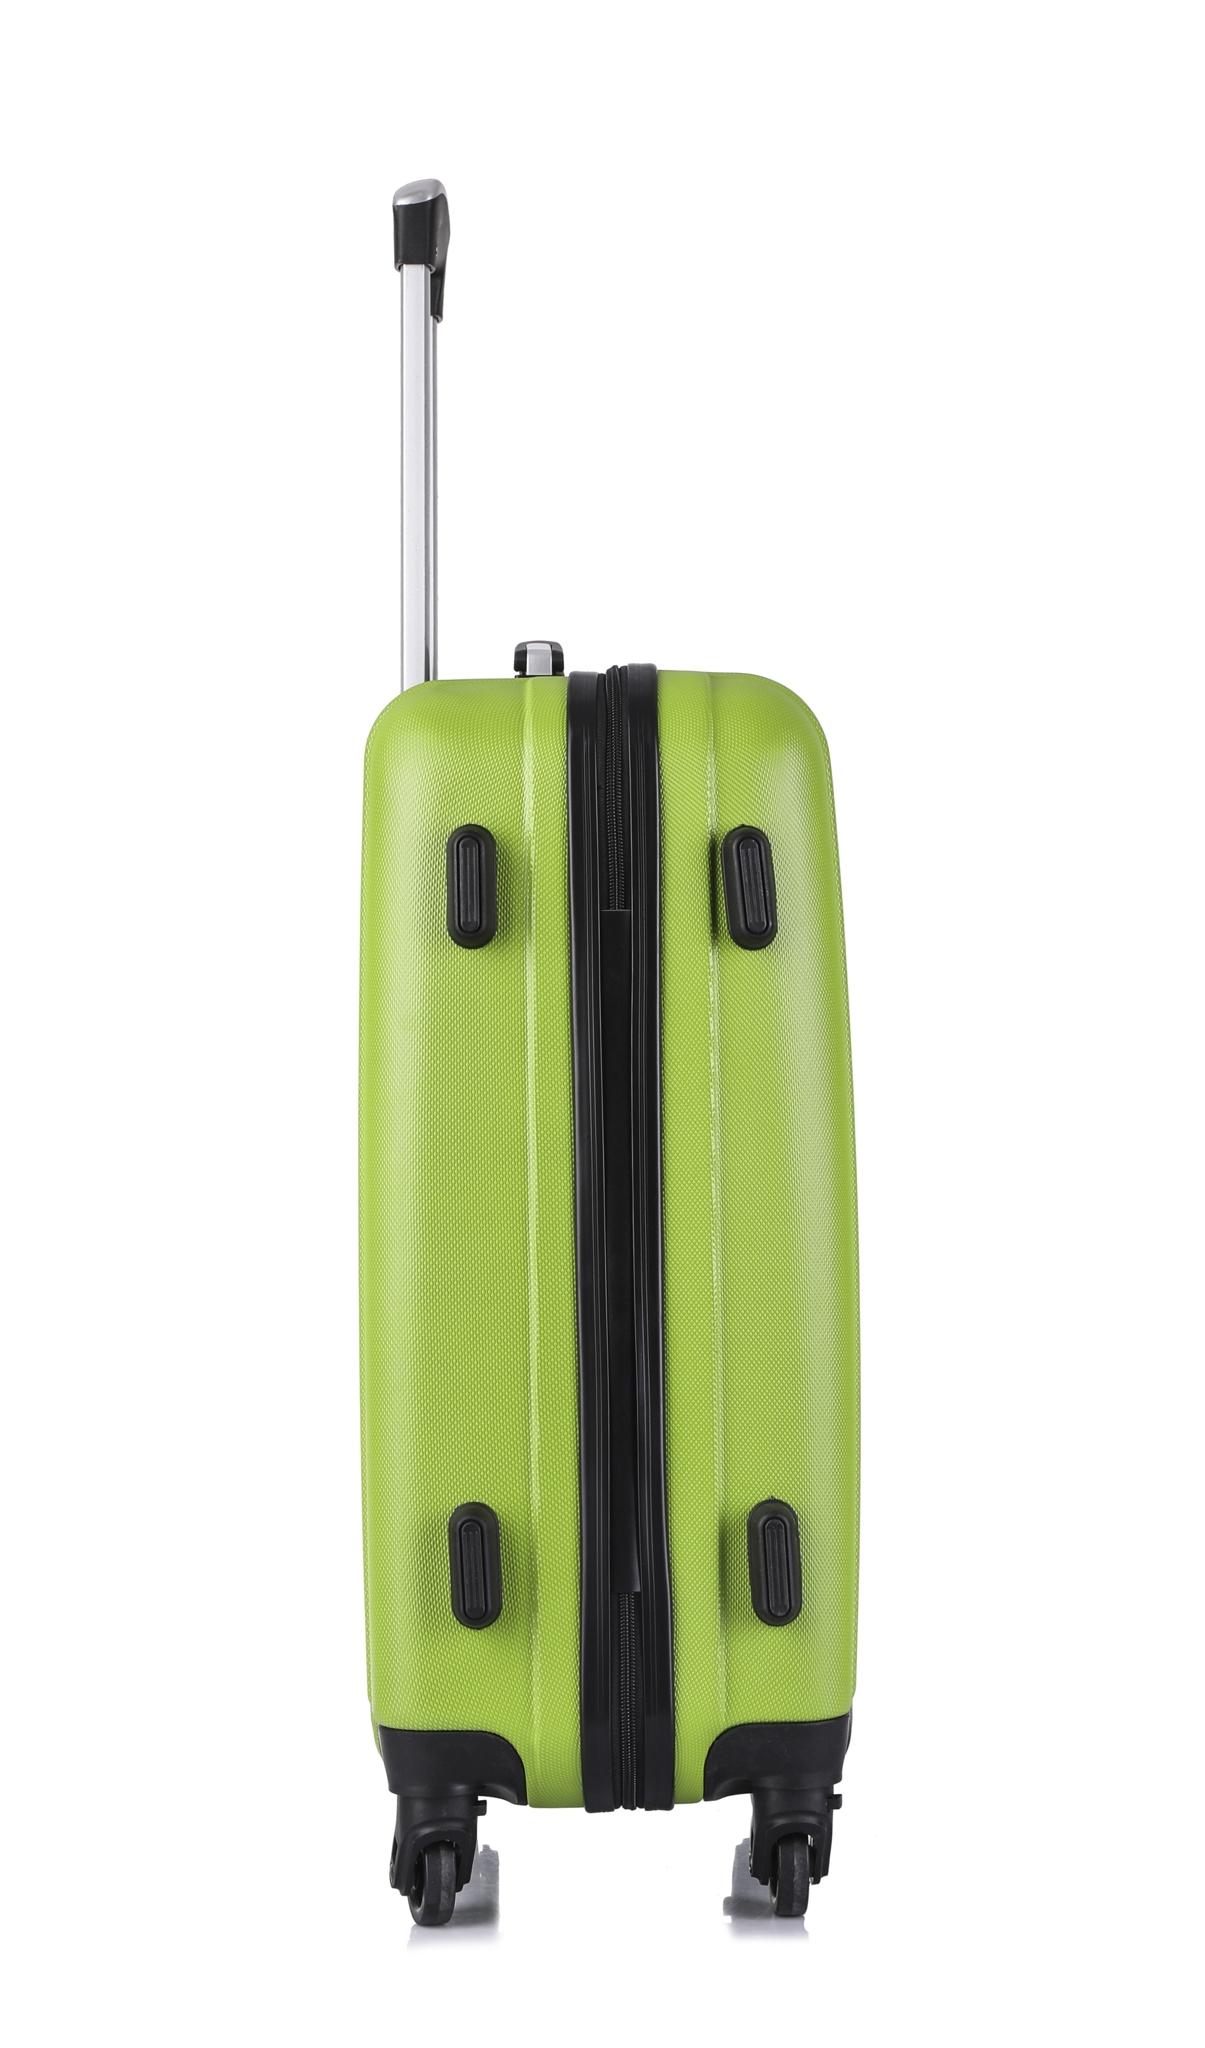 Чемодан со съемными колесами L'case Krabi-22 Зеленый (M)